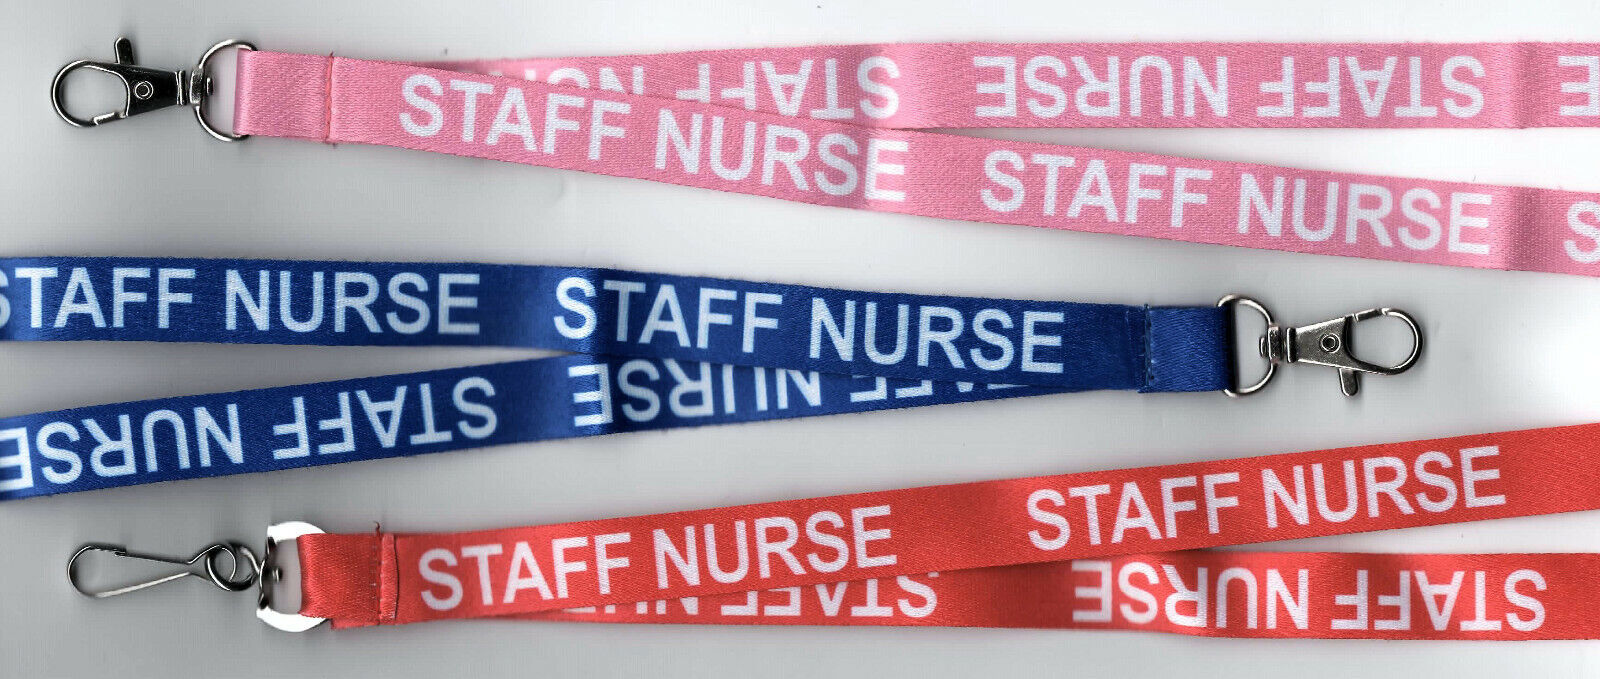 1 x STAFF NURSE Printed Hospital Safety Breakaway Lanyard 3 Colours: FREE UK P&P